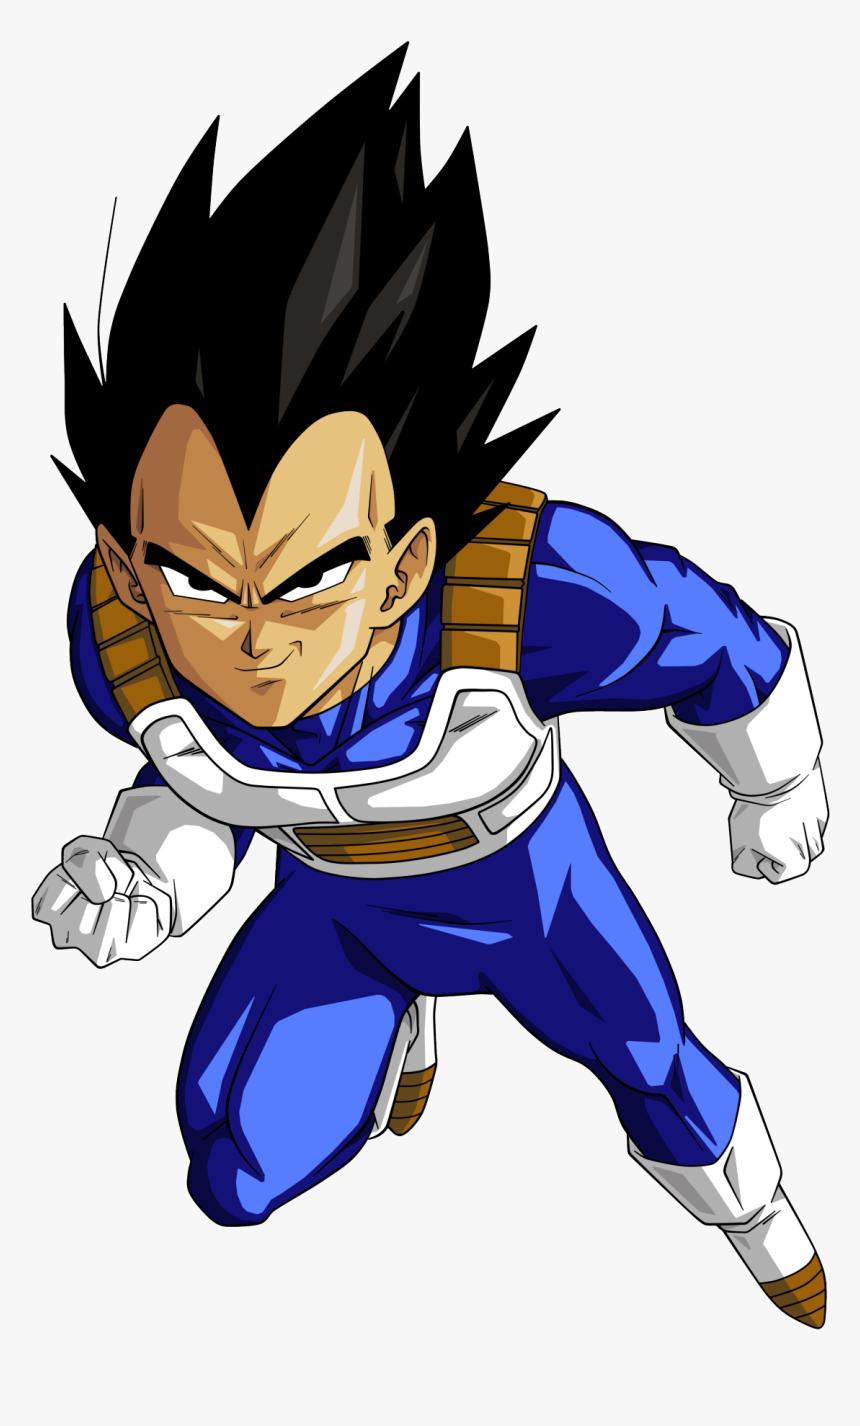 Joke Battles Wiki - Vegeta Dragon Ball Z Characters, HD Png Download, Free Download